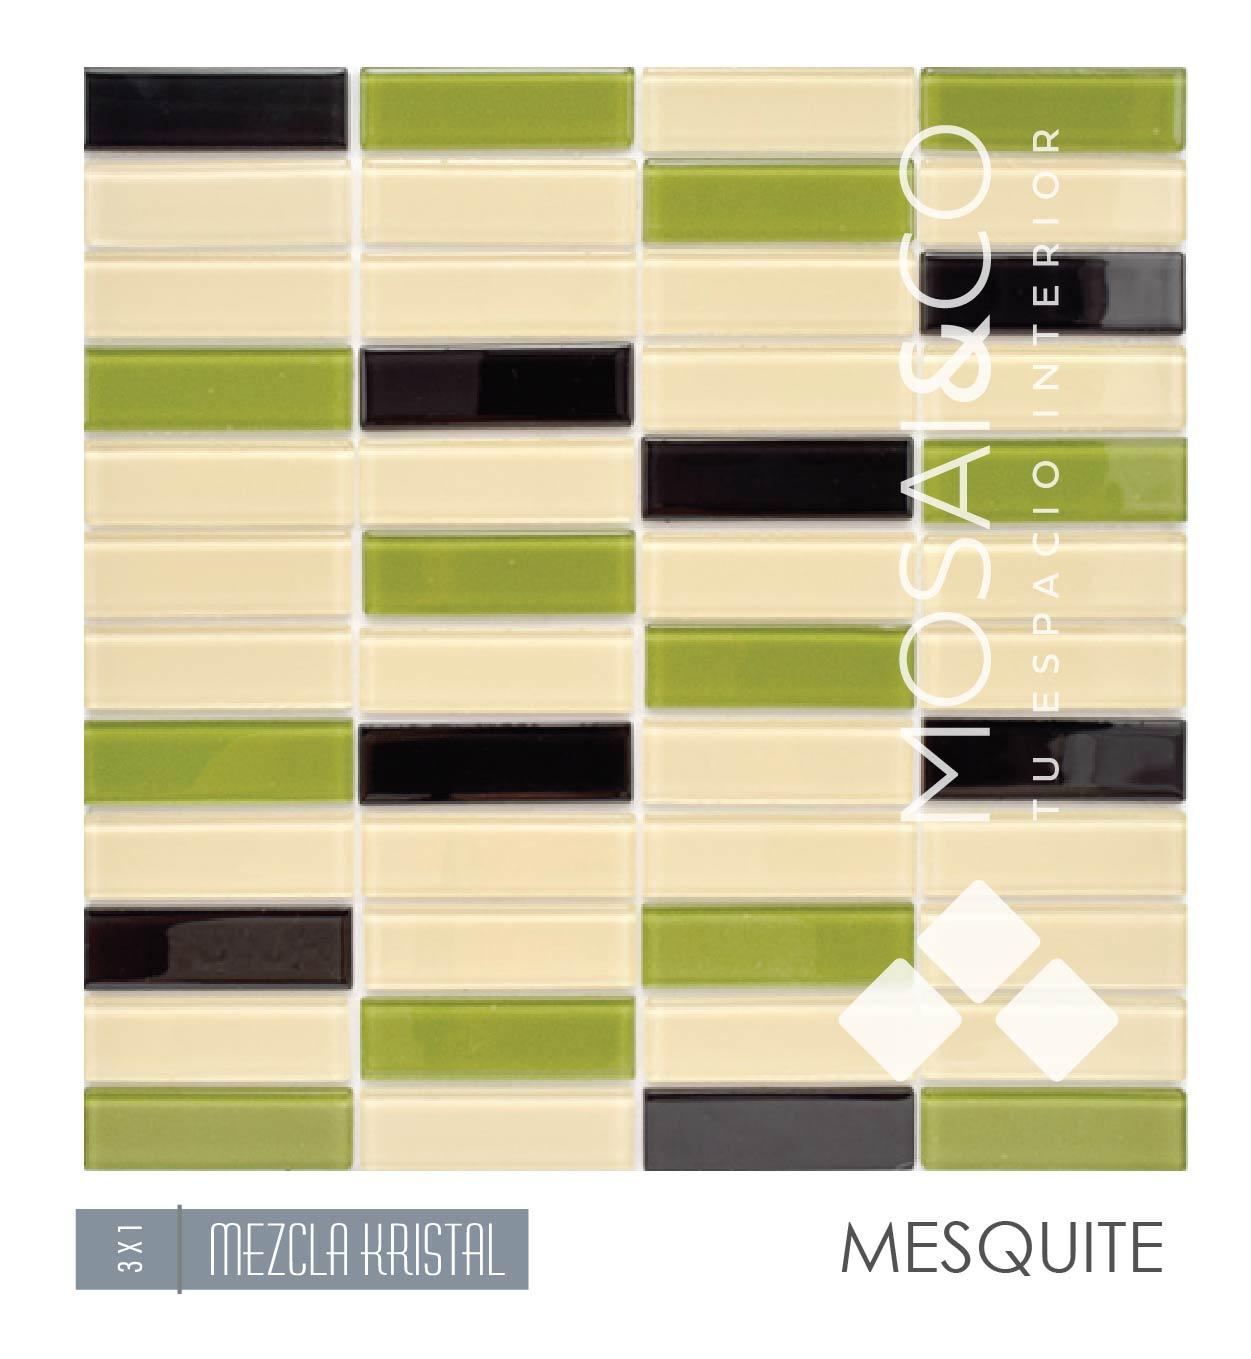 mosaico-linea-mezcla-kristal-mosaiandco-3X1-mesquite